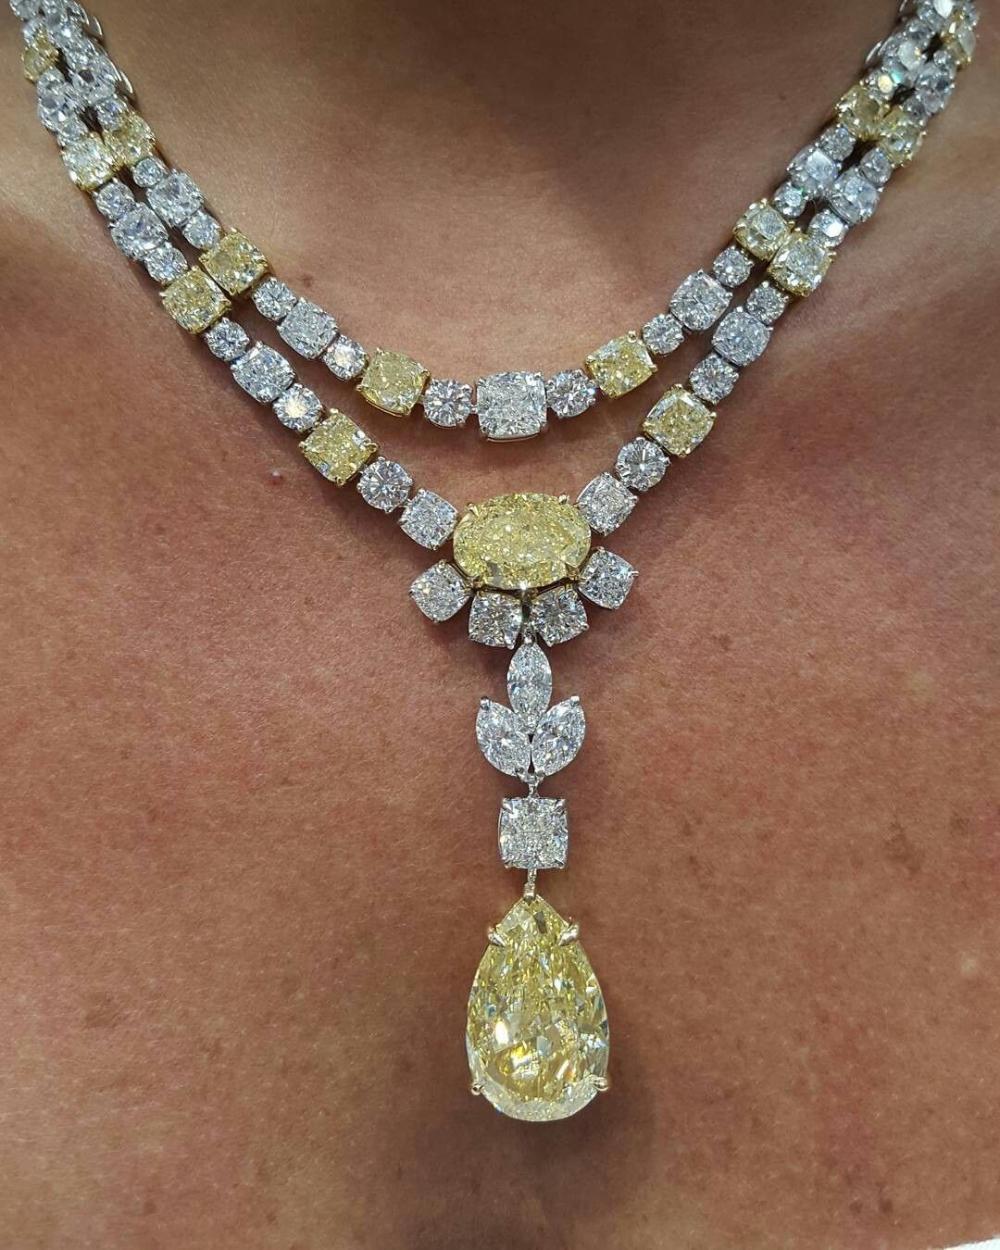 Gemville Jewelry Magazine On Instagram Impressive 102 5ct Yellow Diamond Necklace Diamond Necklace Beautiful Necklaces